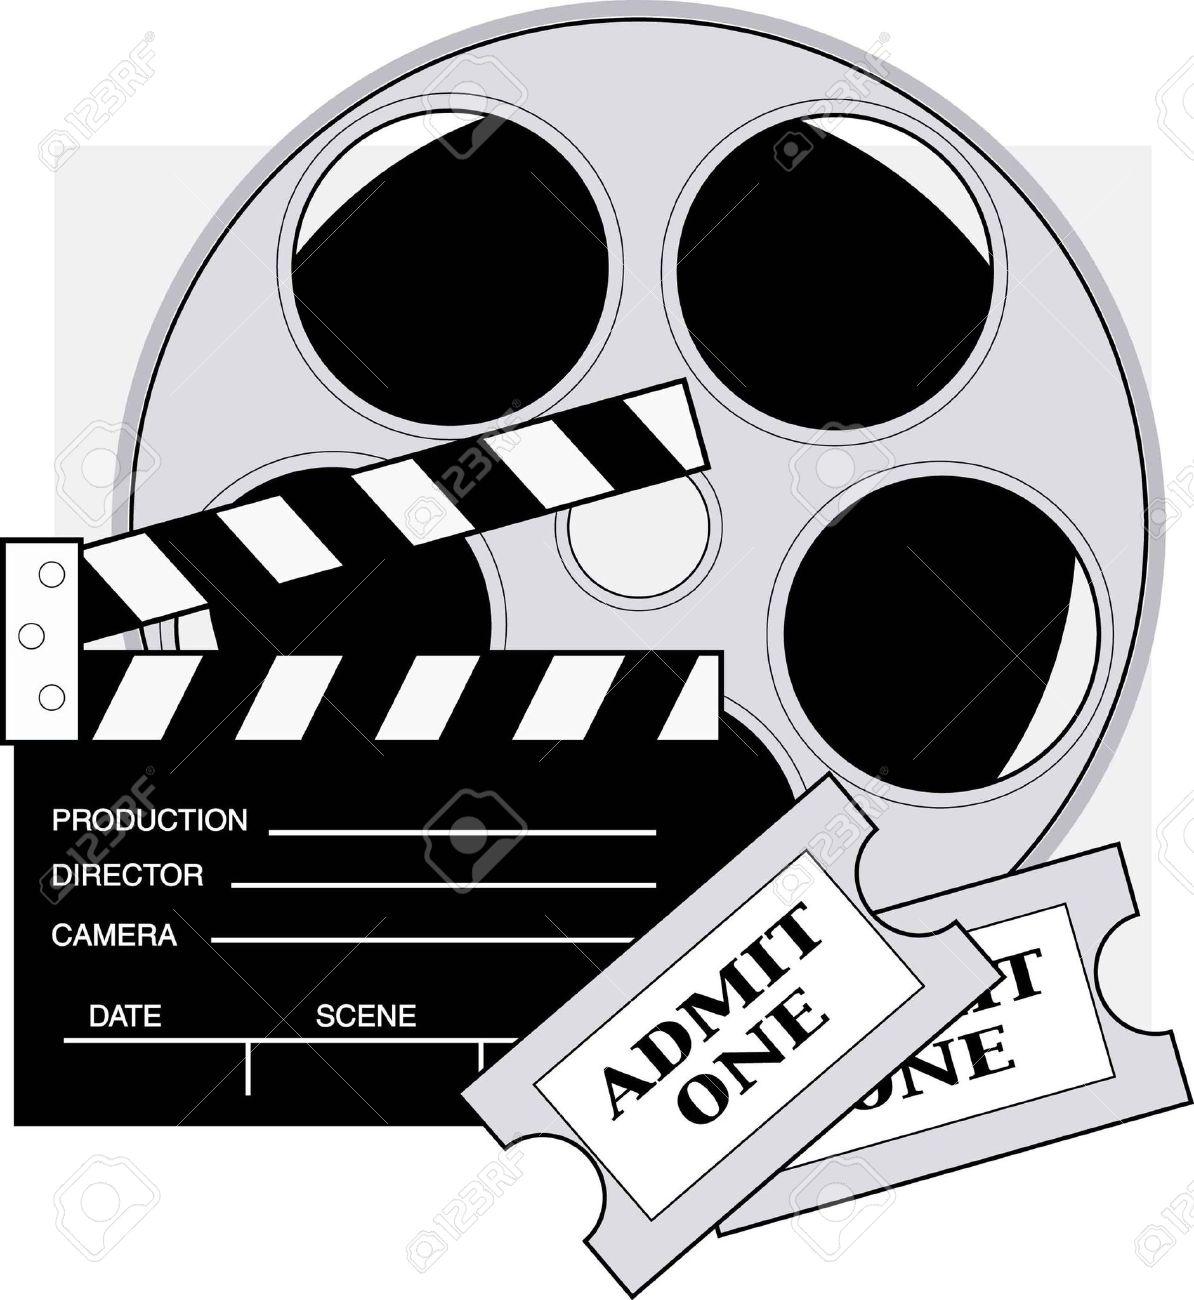 Movie clipart film director Symbol Cinema Street movie Cinema